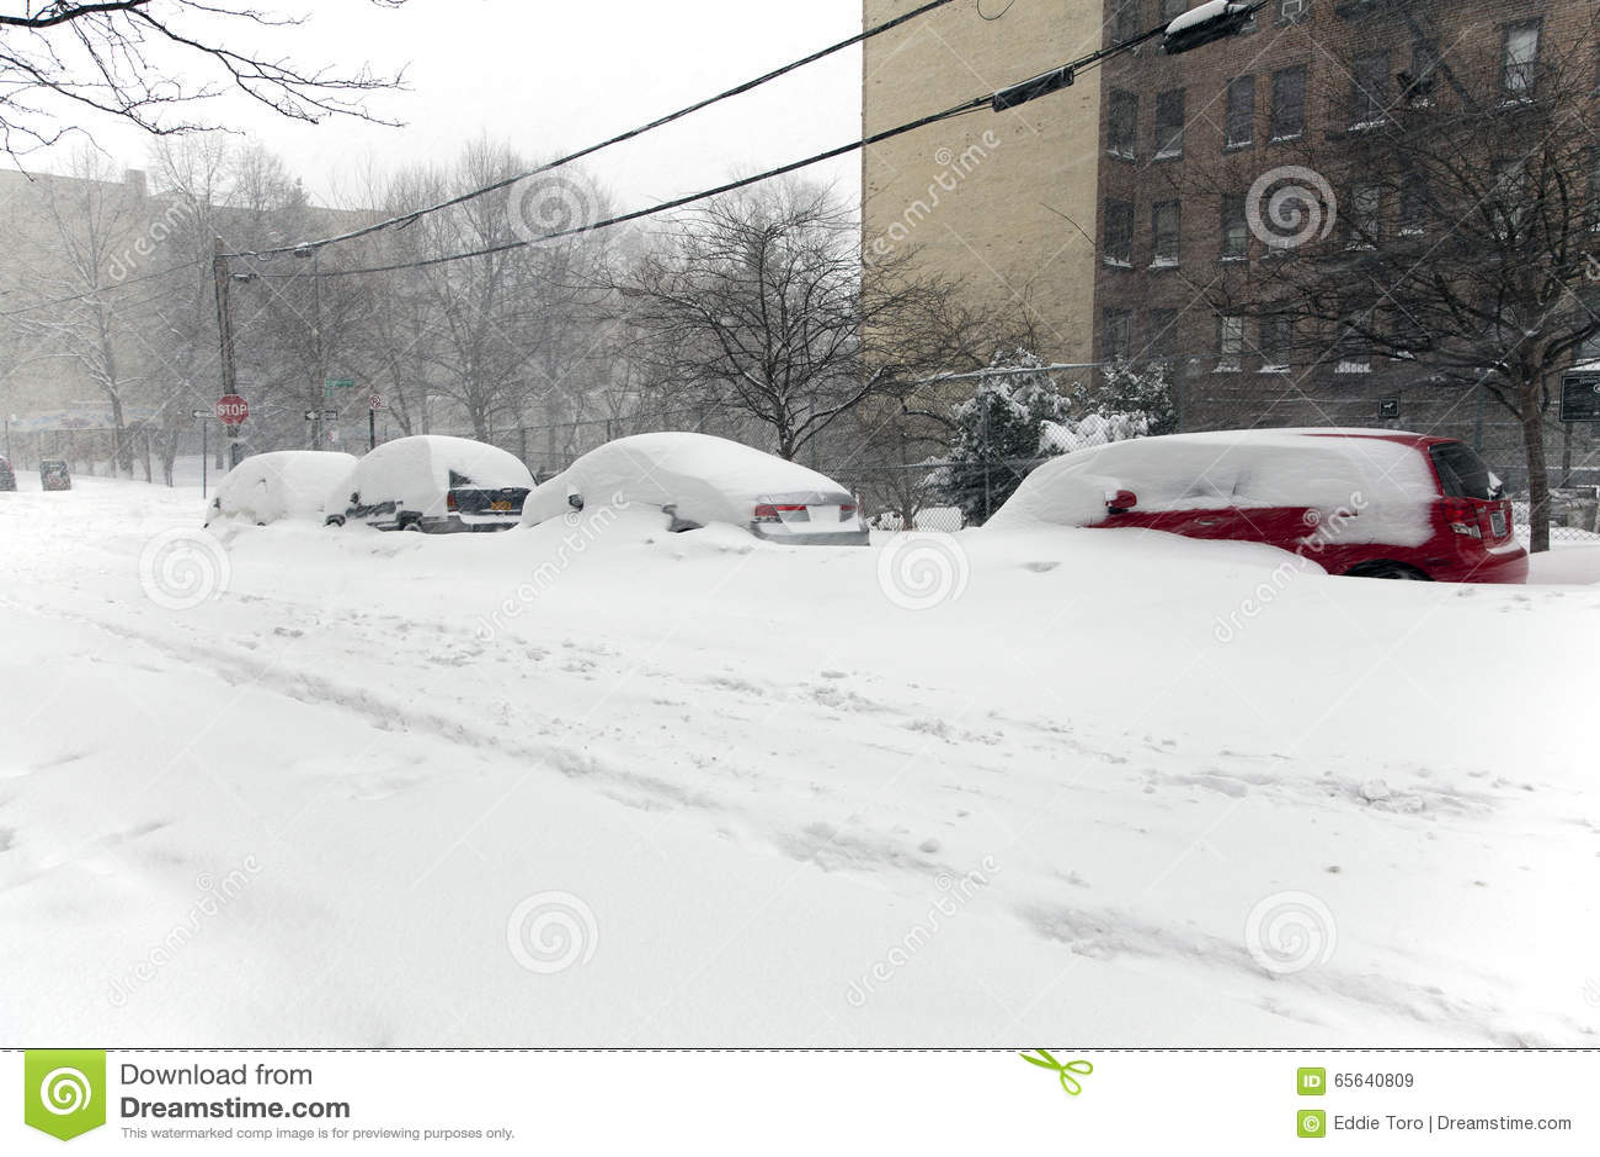 Voitures de burries de neige dans la tempête de neige Jonas dans le Bronx New York